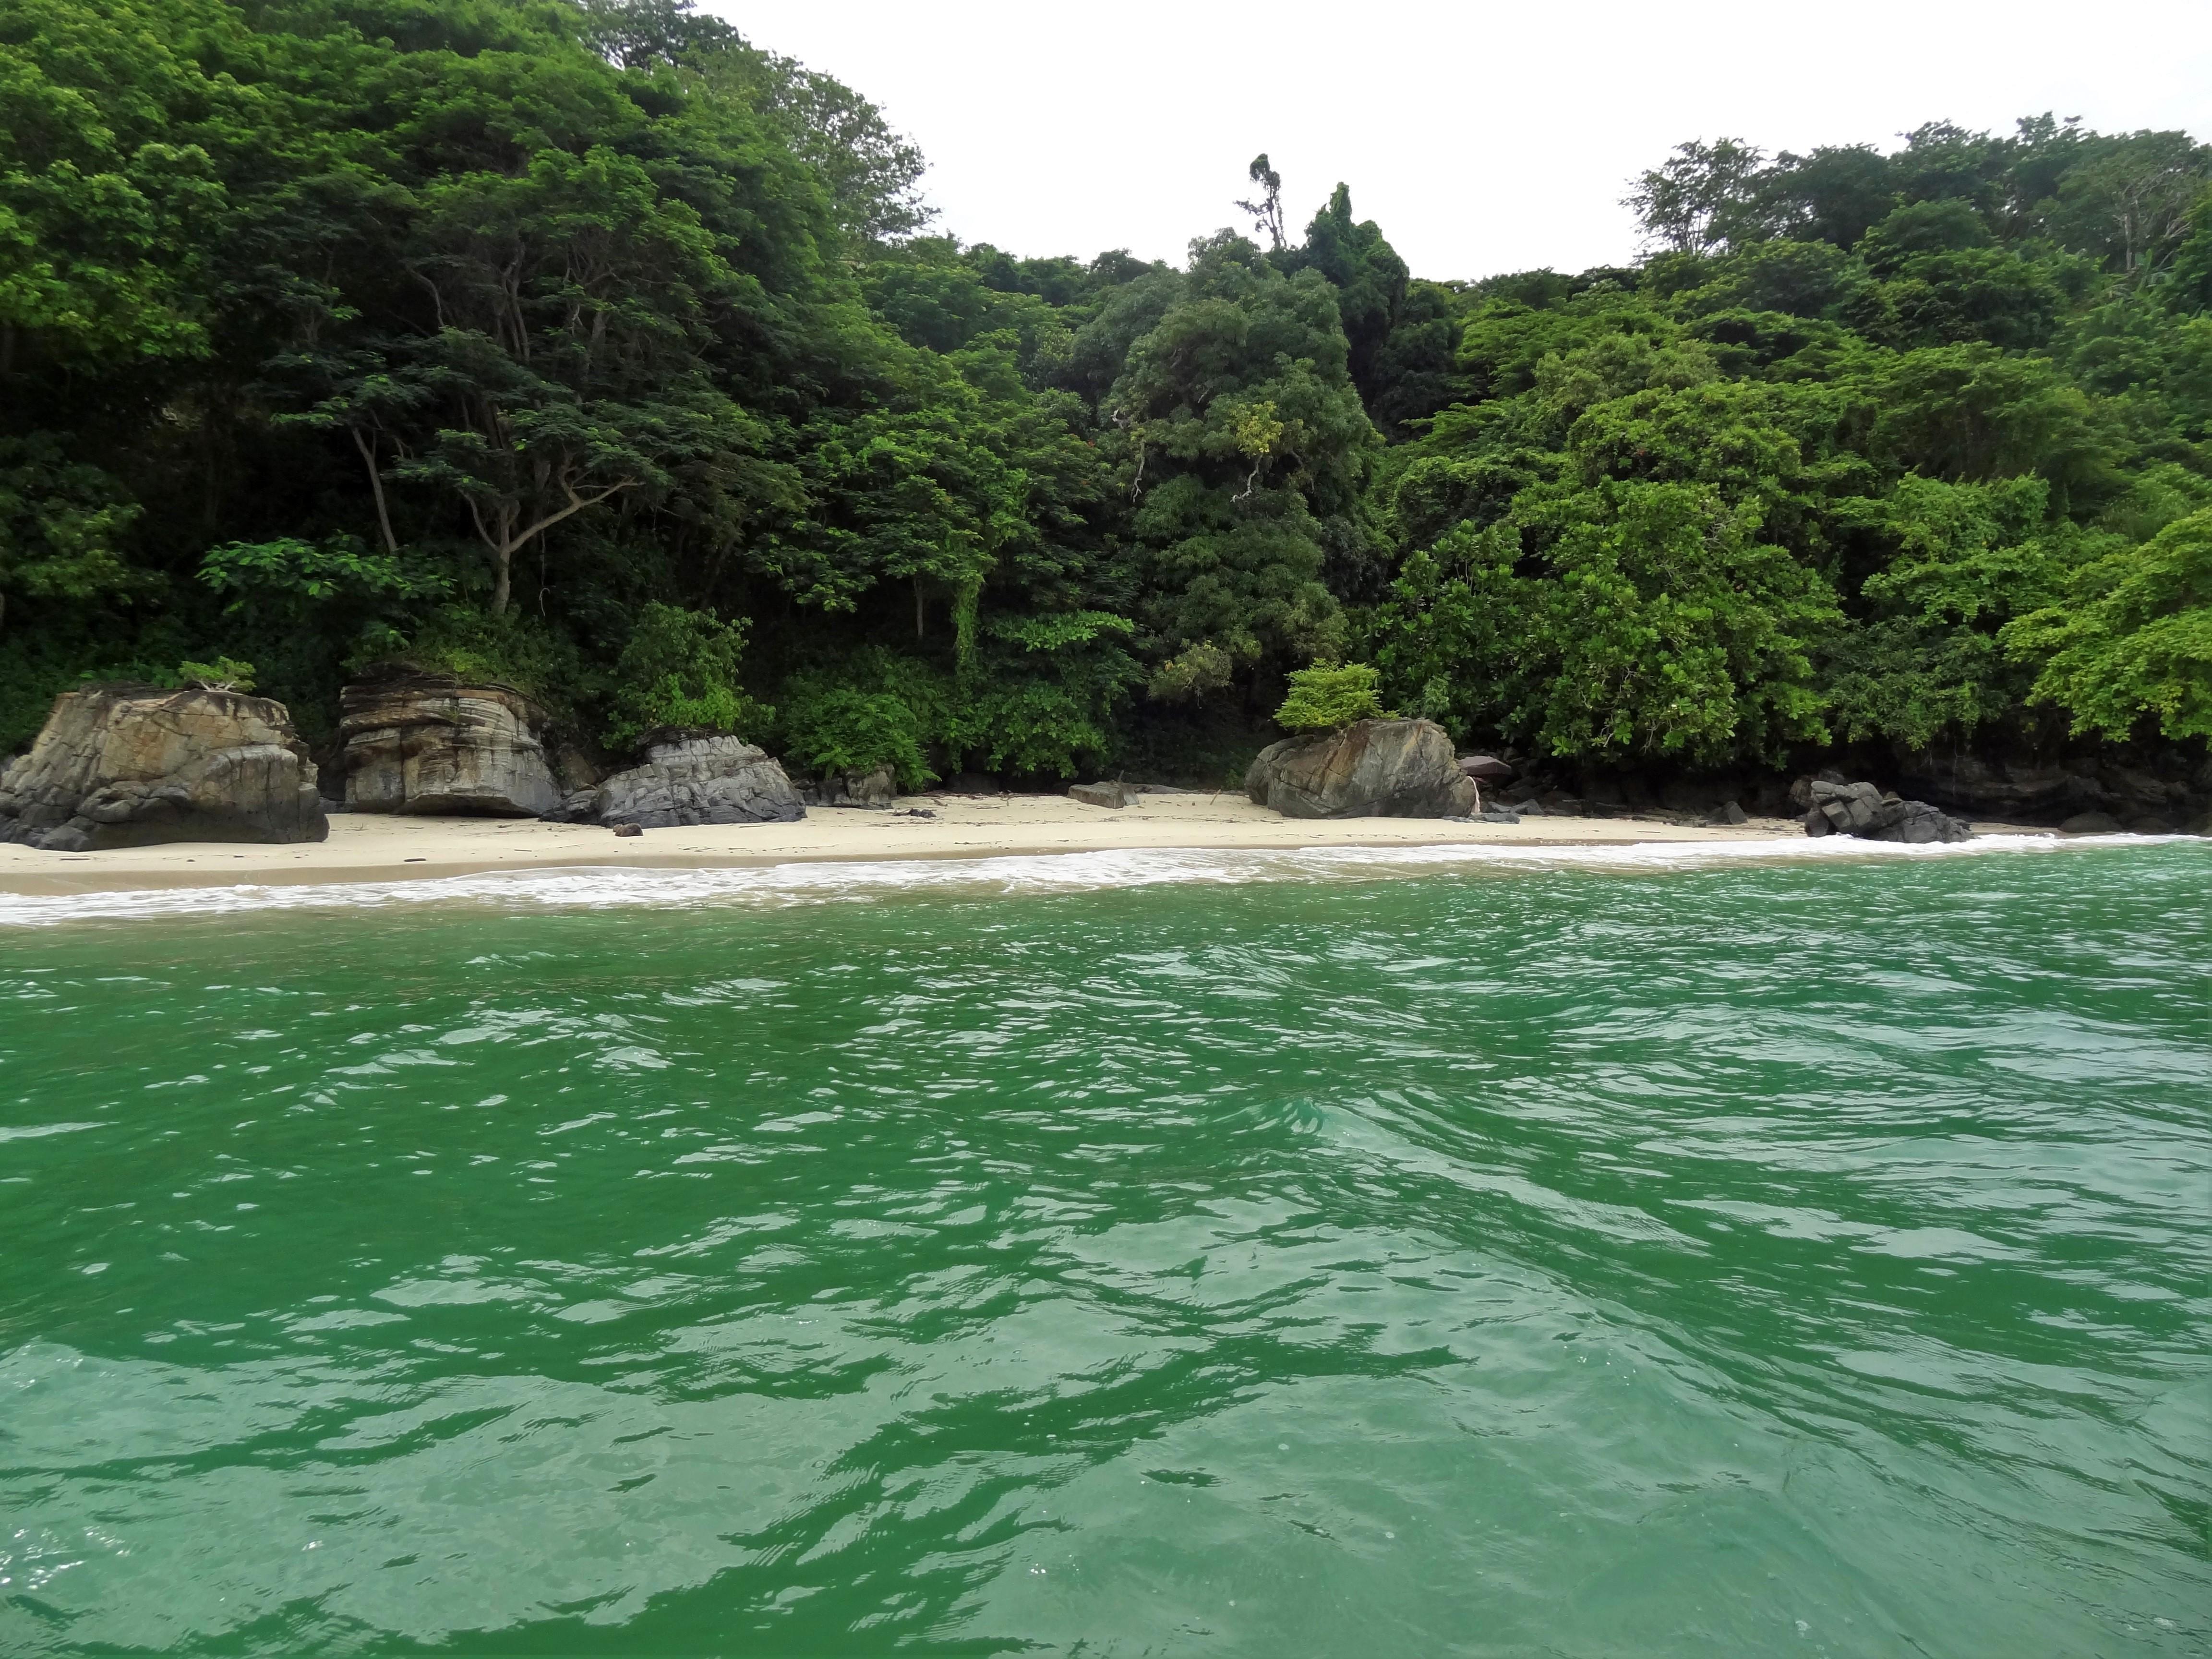 Private Secluded Beach Secret Spot Madagascar [OC ...